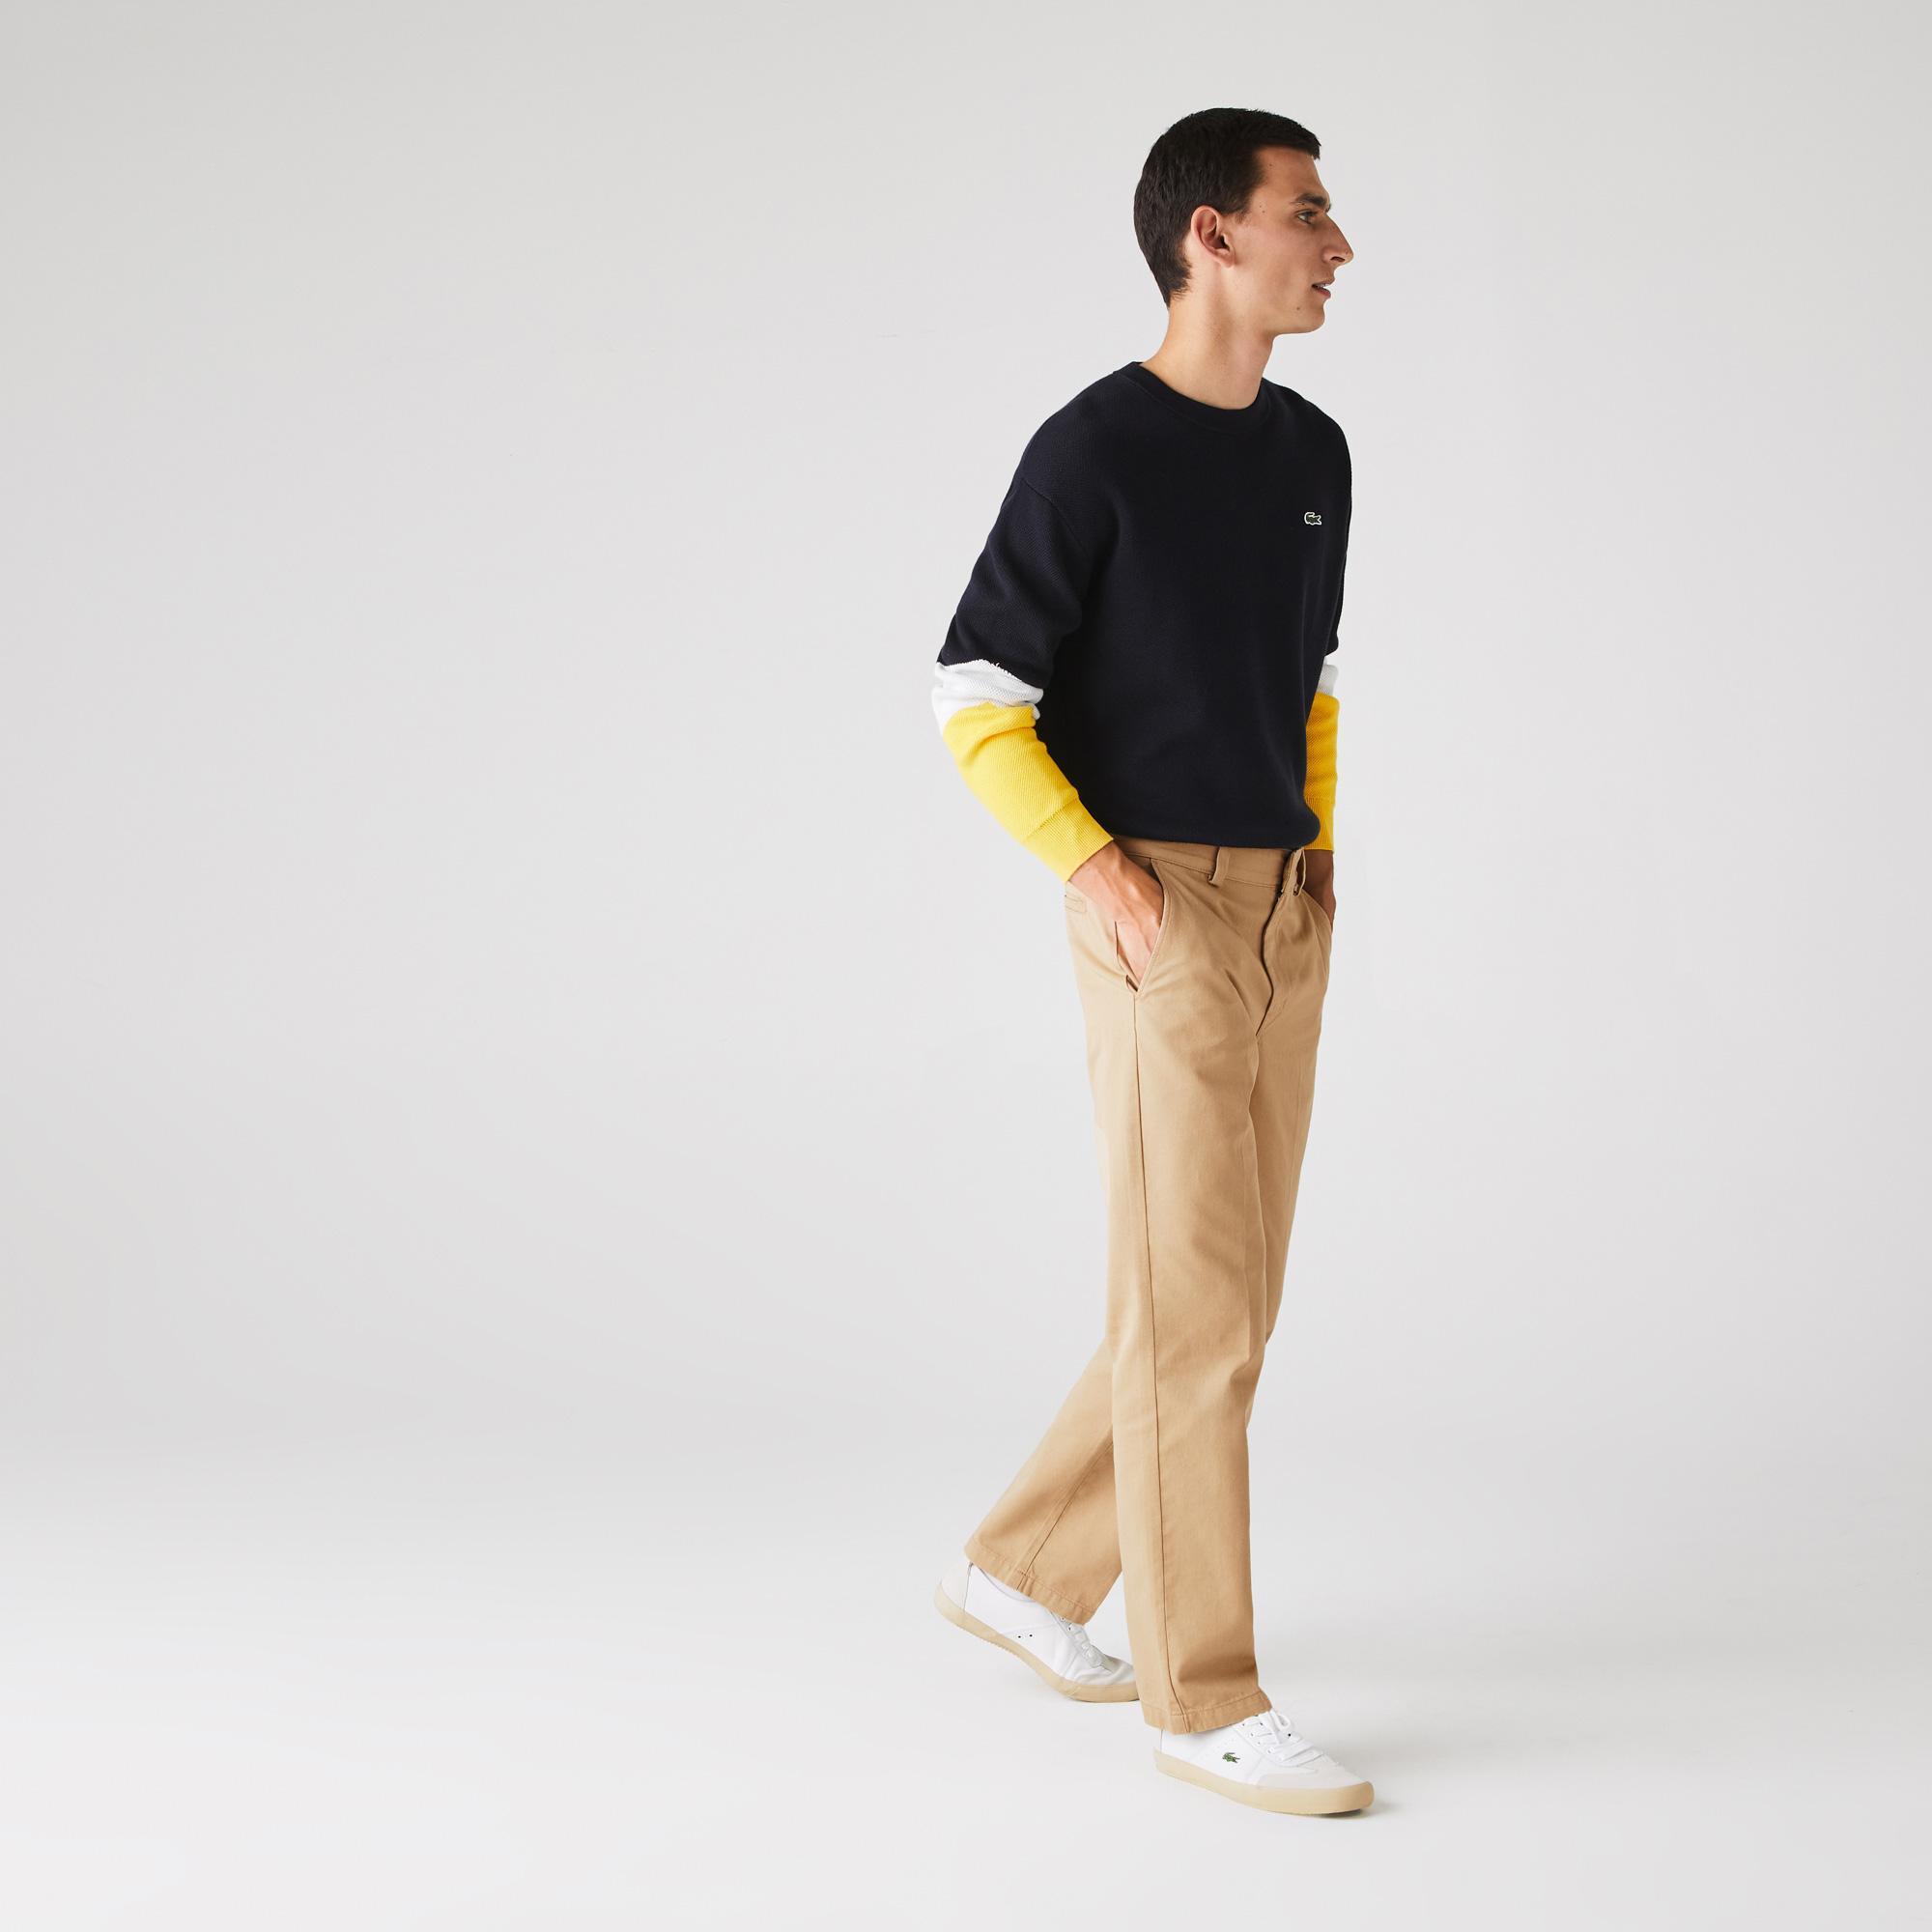 Lacoste Men's Lıve Standard Fit Pleated Cotton Chino Pants